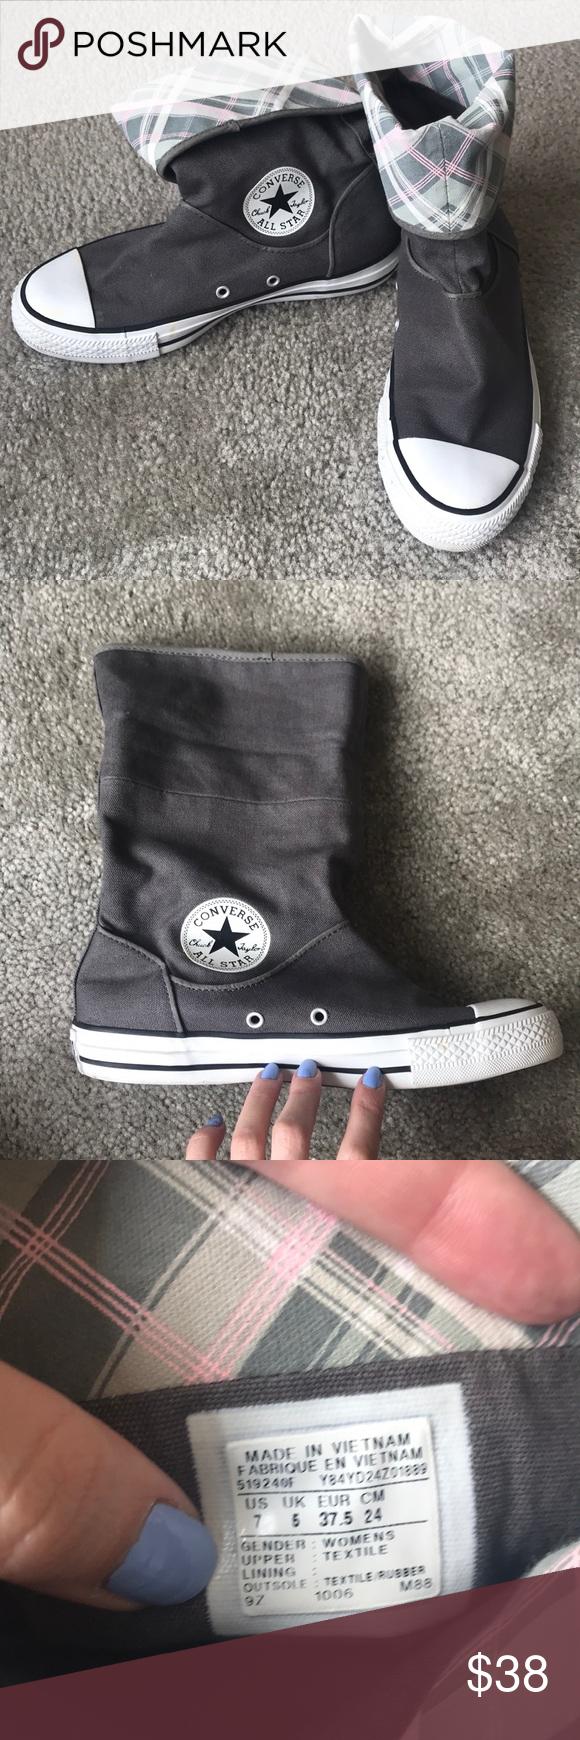 "Converse ""rain boots"" Grey with plaid inside. Kind of a rain"